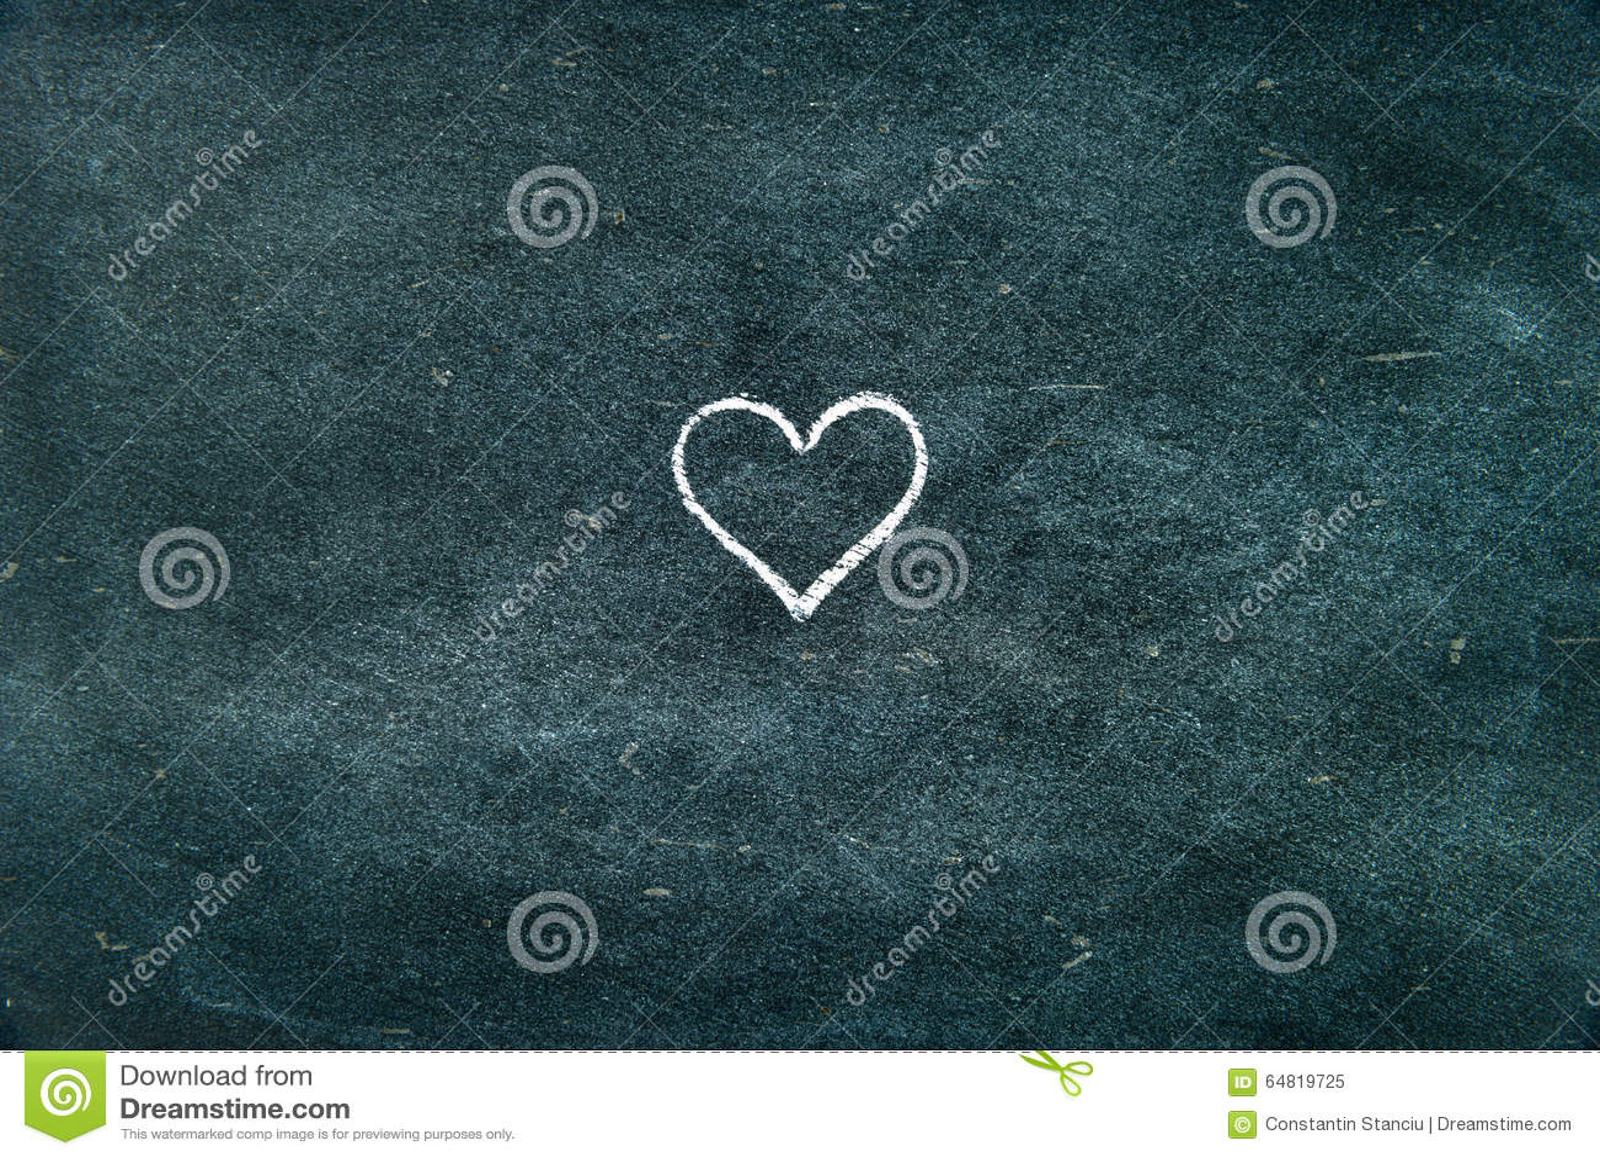 Hand drawing heart shape symbol on blackboard stock image image royalty free stock photo biocorpaavc Gallery